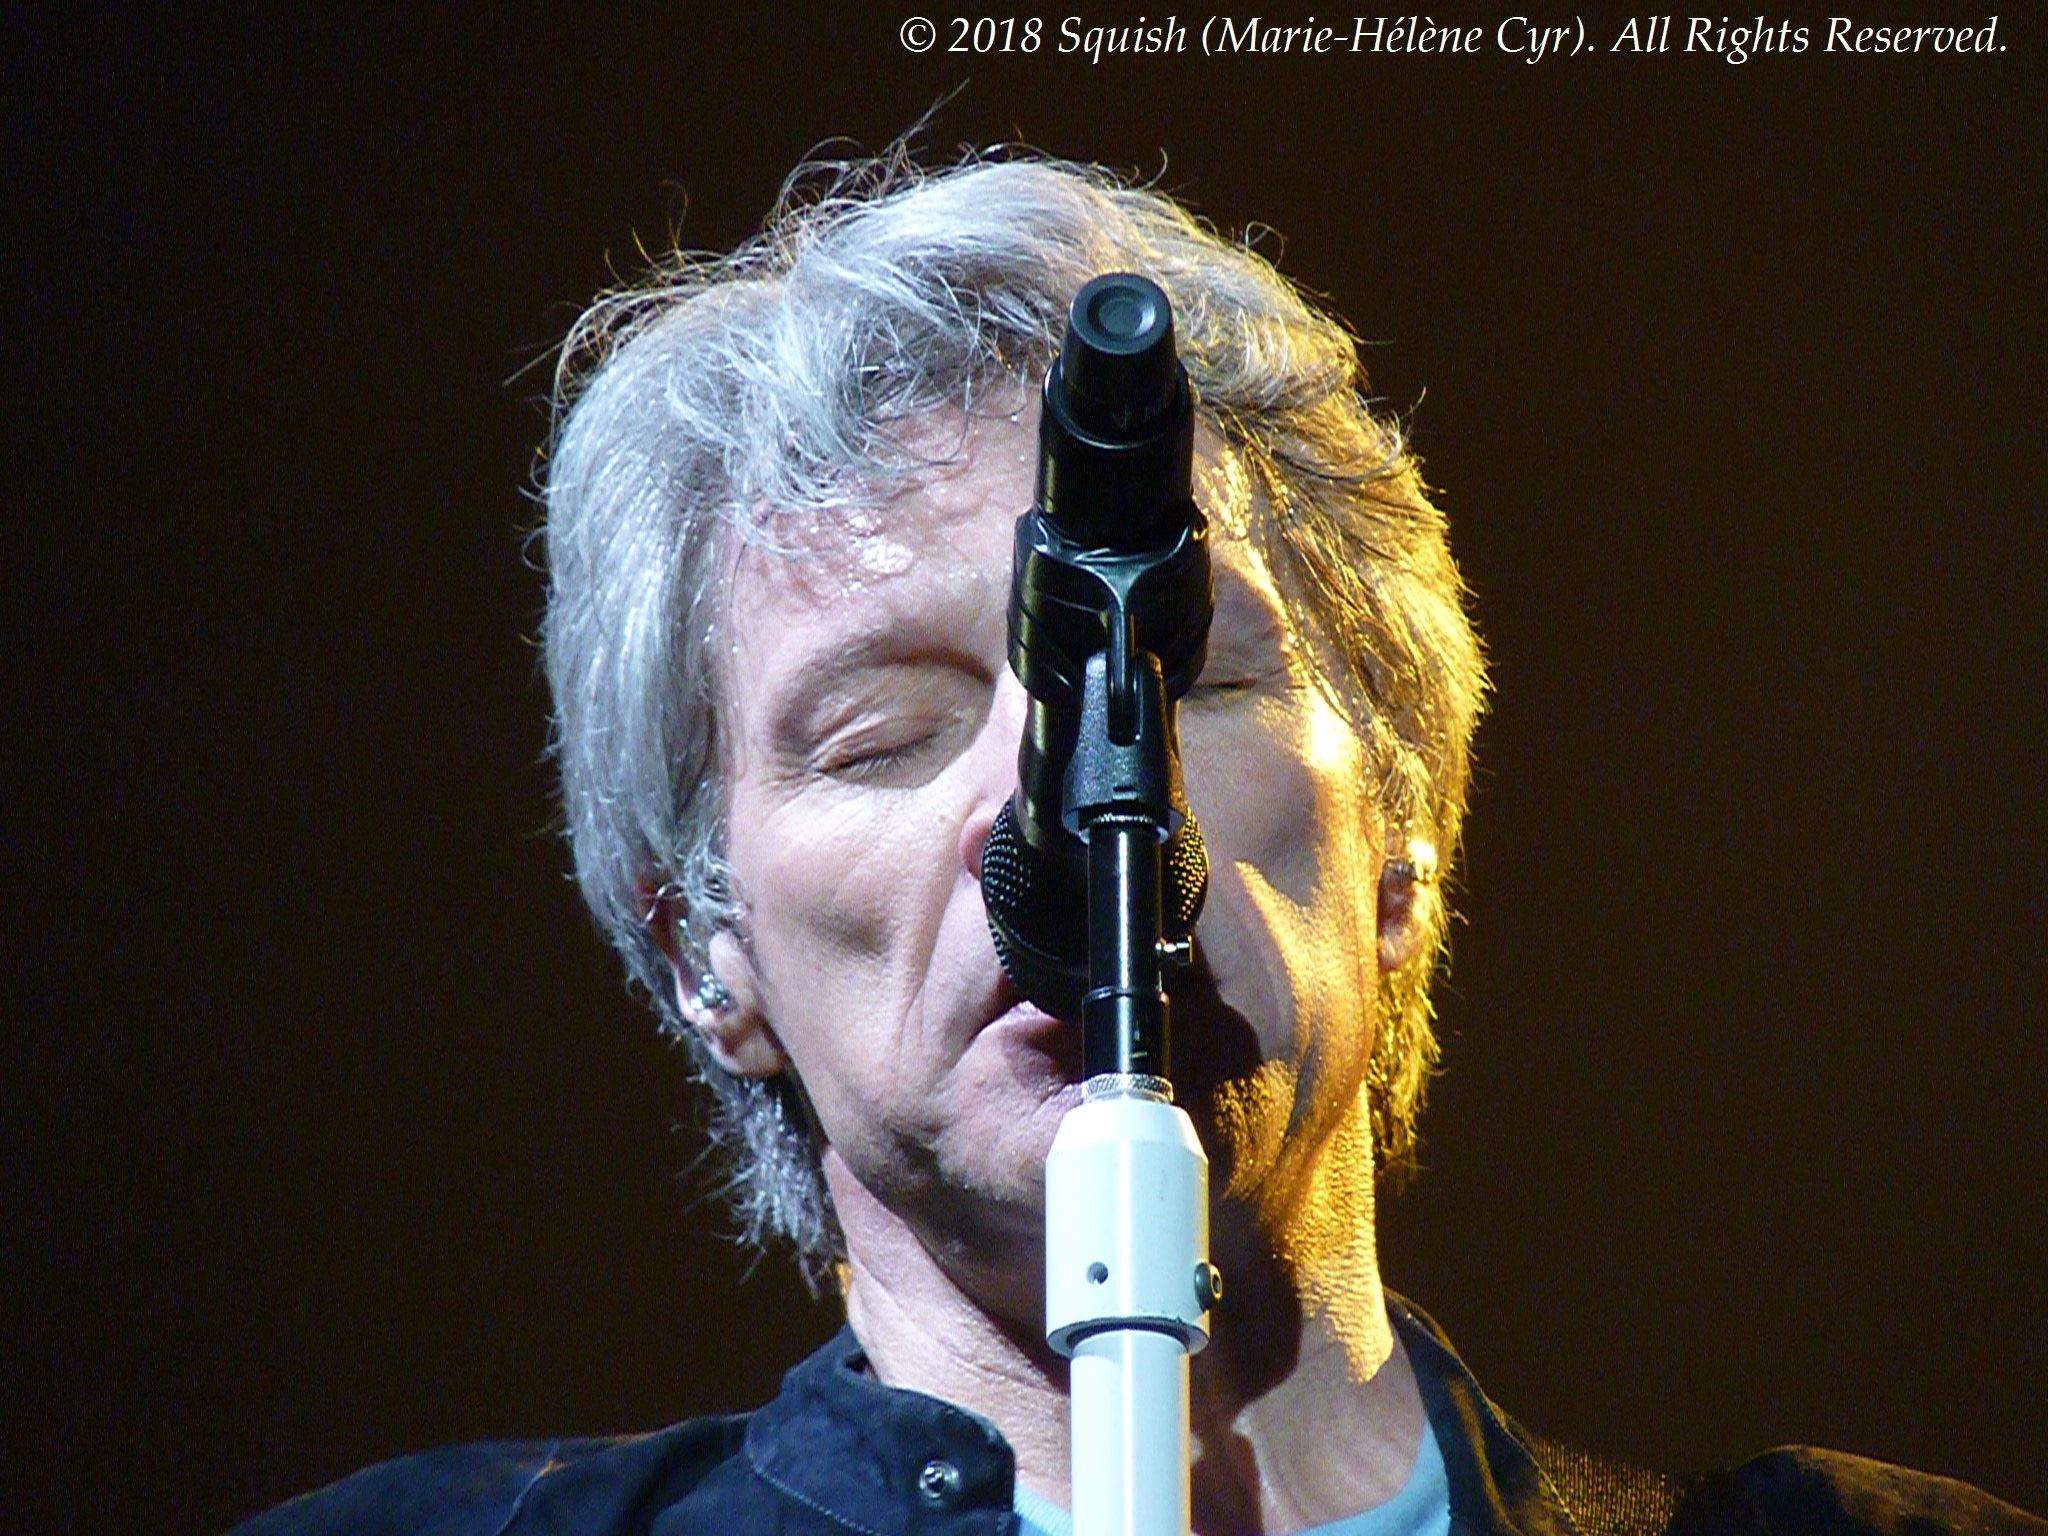 Bon Jovi - Bell Centre, Quebec, Canada (May 17, 2018)